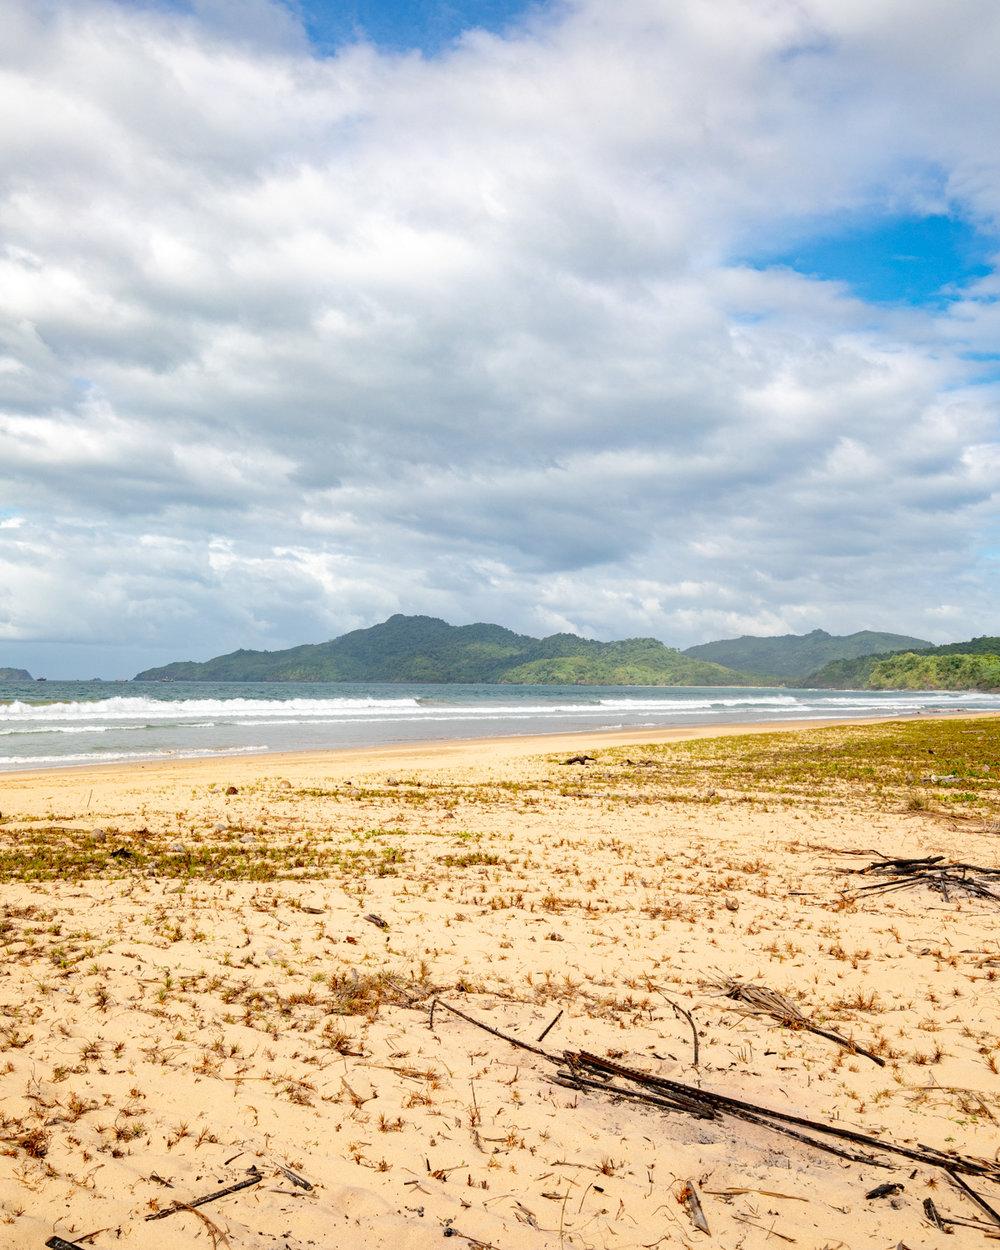 Duli Beach, Palawan